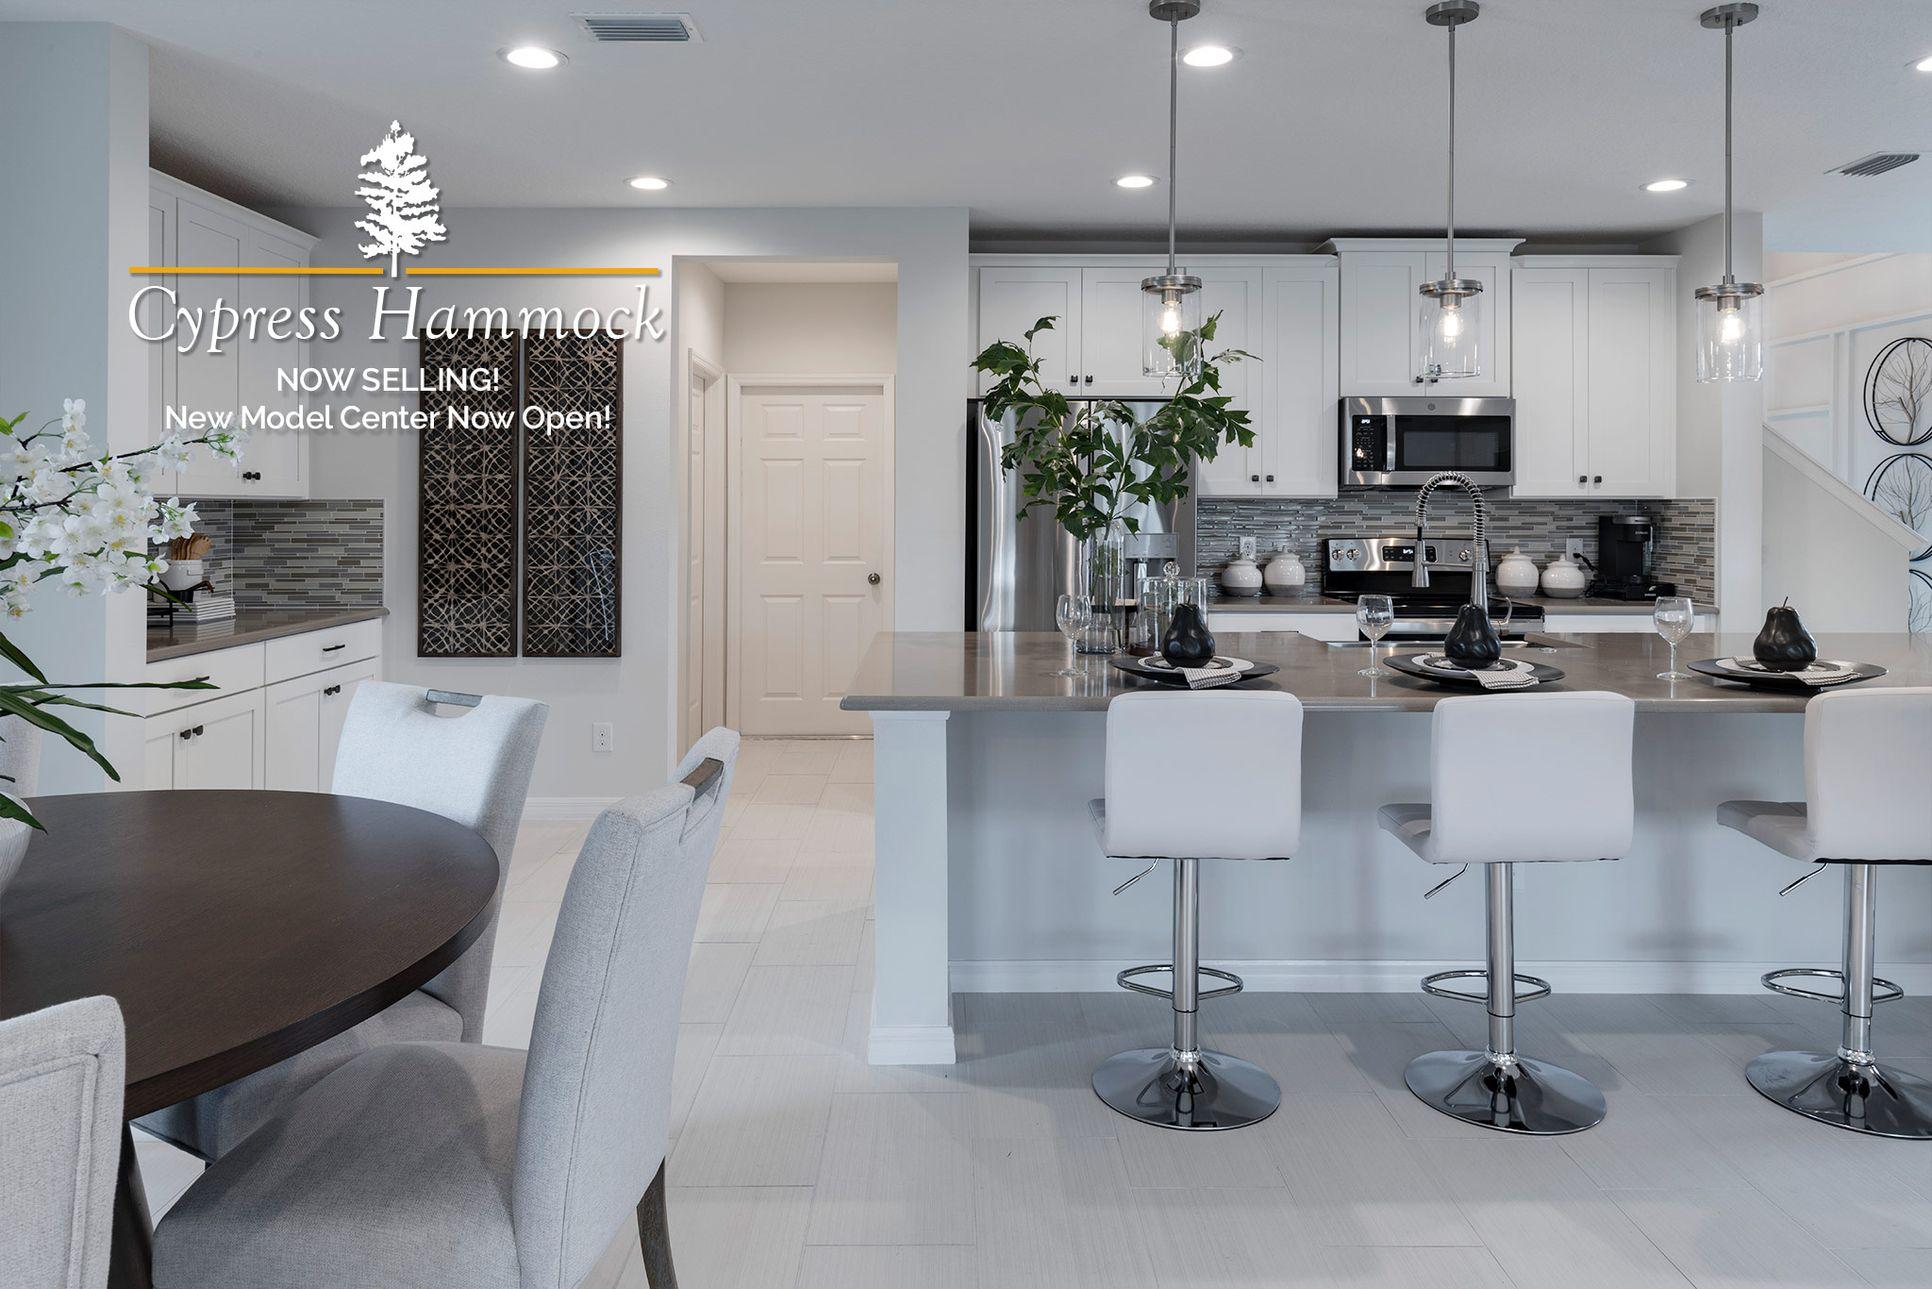 Cypress Hammock's Brand New Model Home is NOW OPEN!